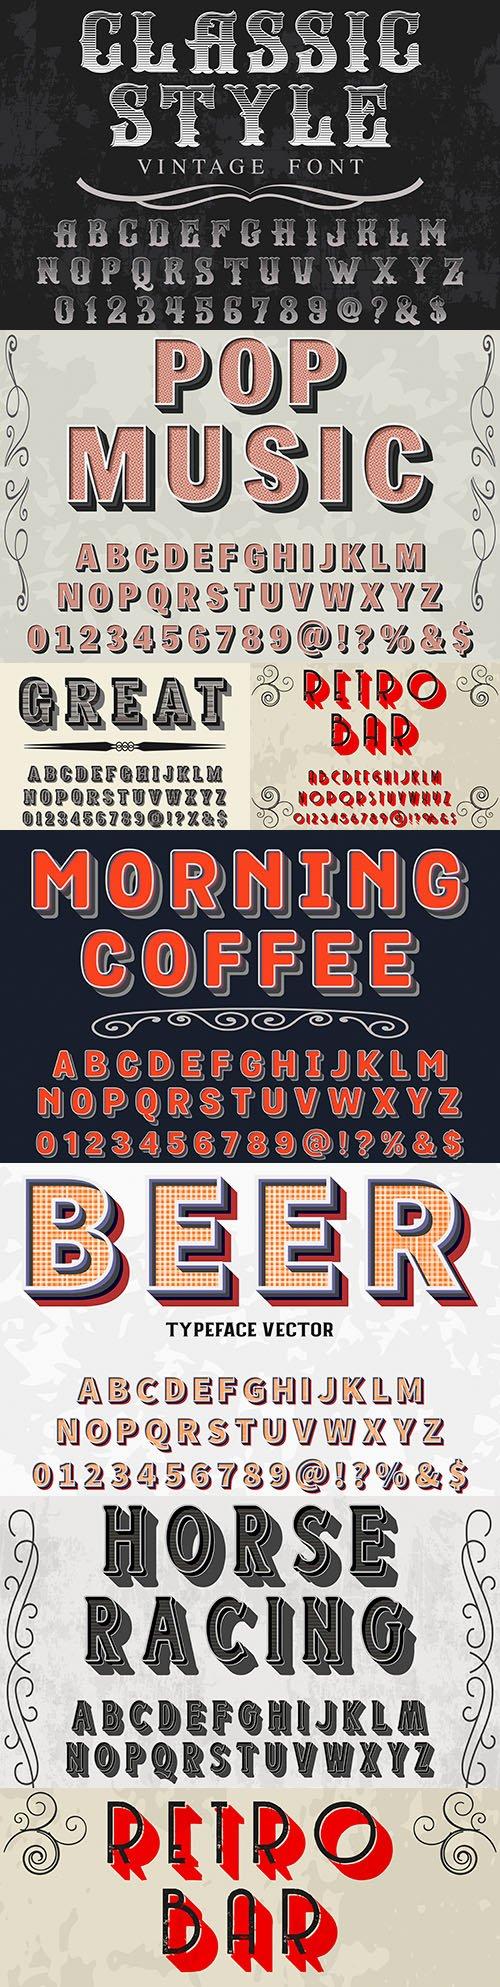 Editable font and alphabet retro illustration design